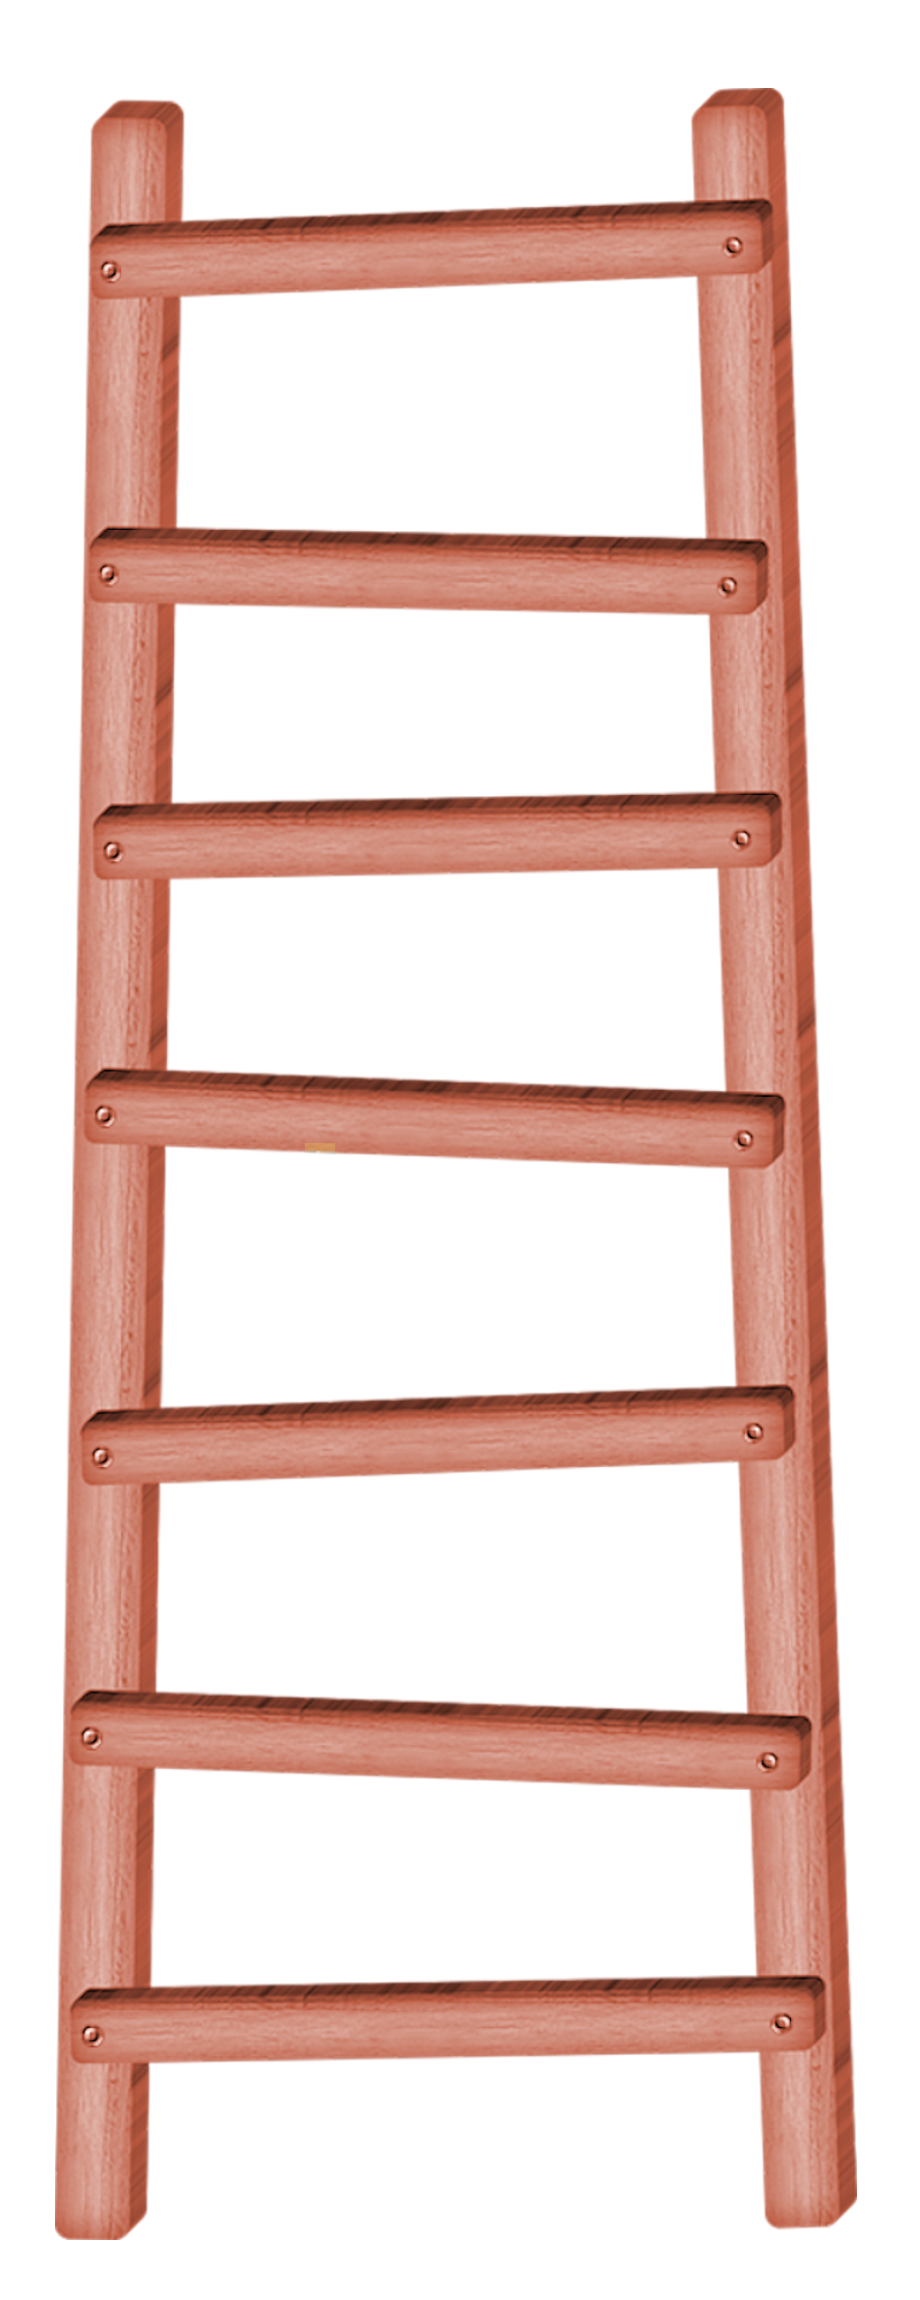 vector black and white download Ladder transparent background. Png images free download.